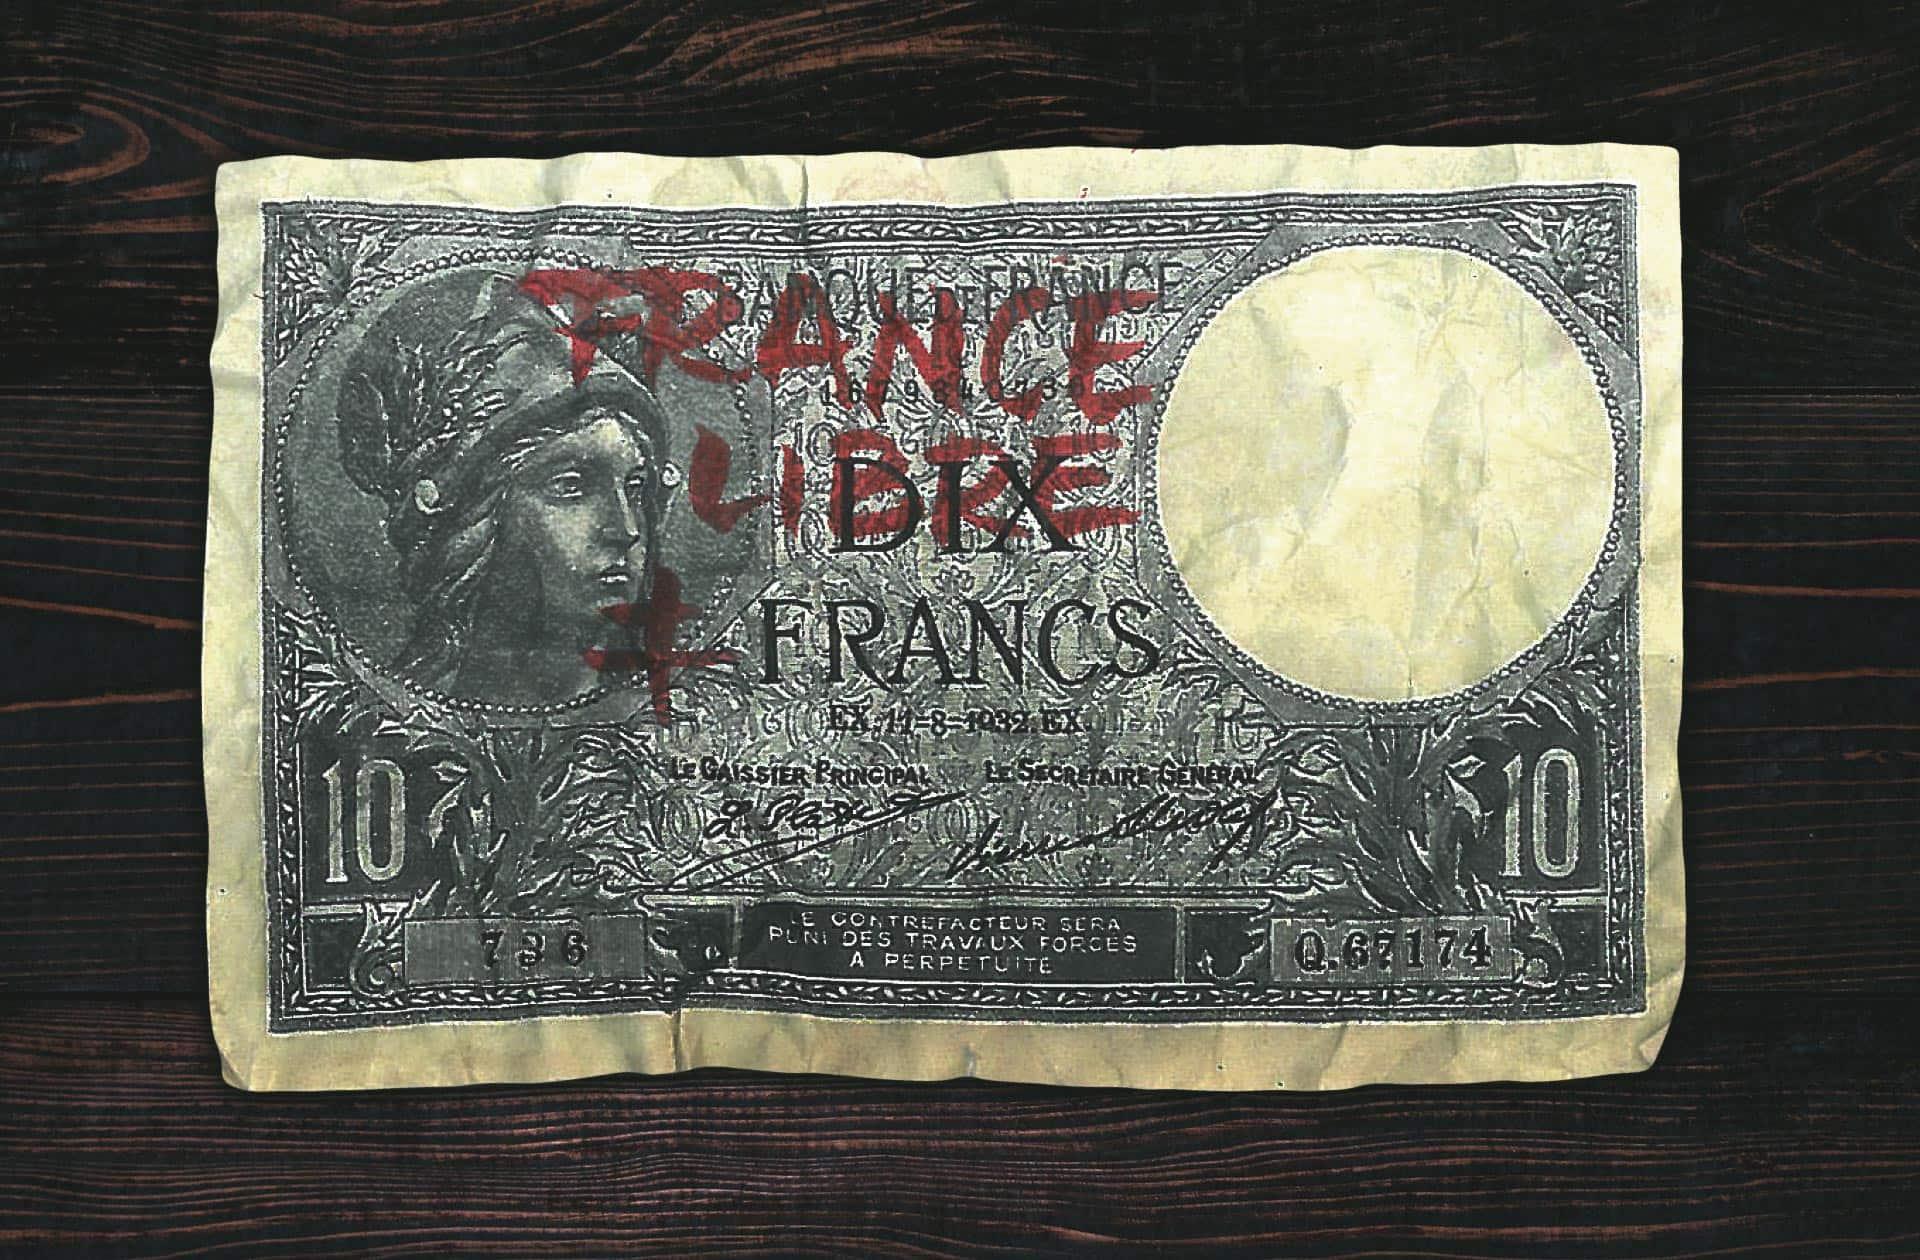 Free France episode 8 background